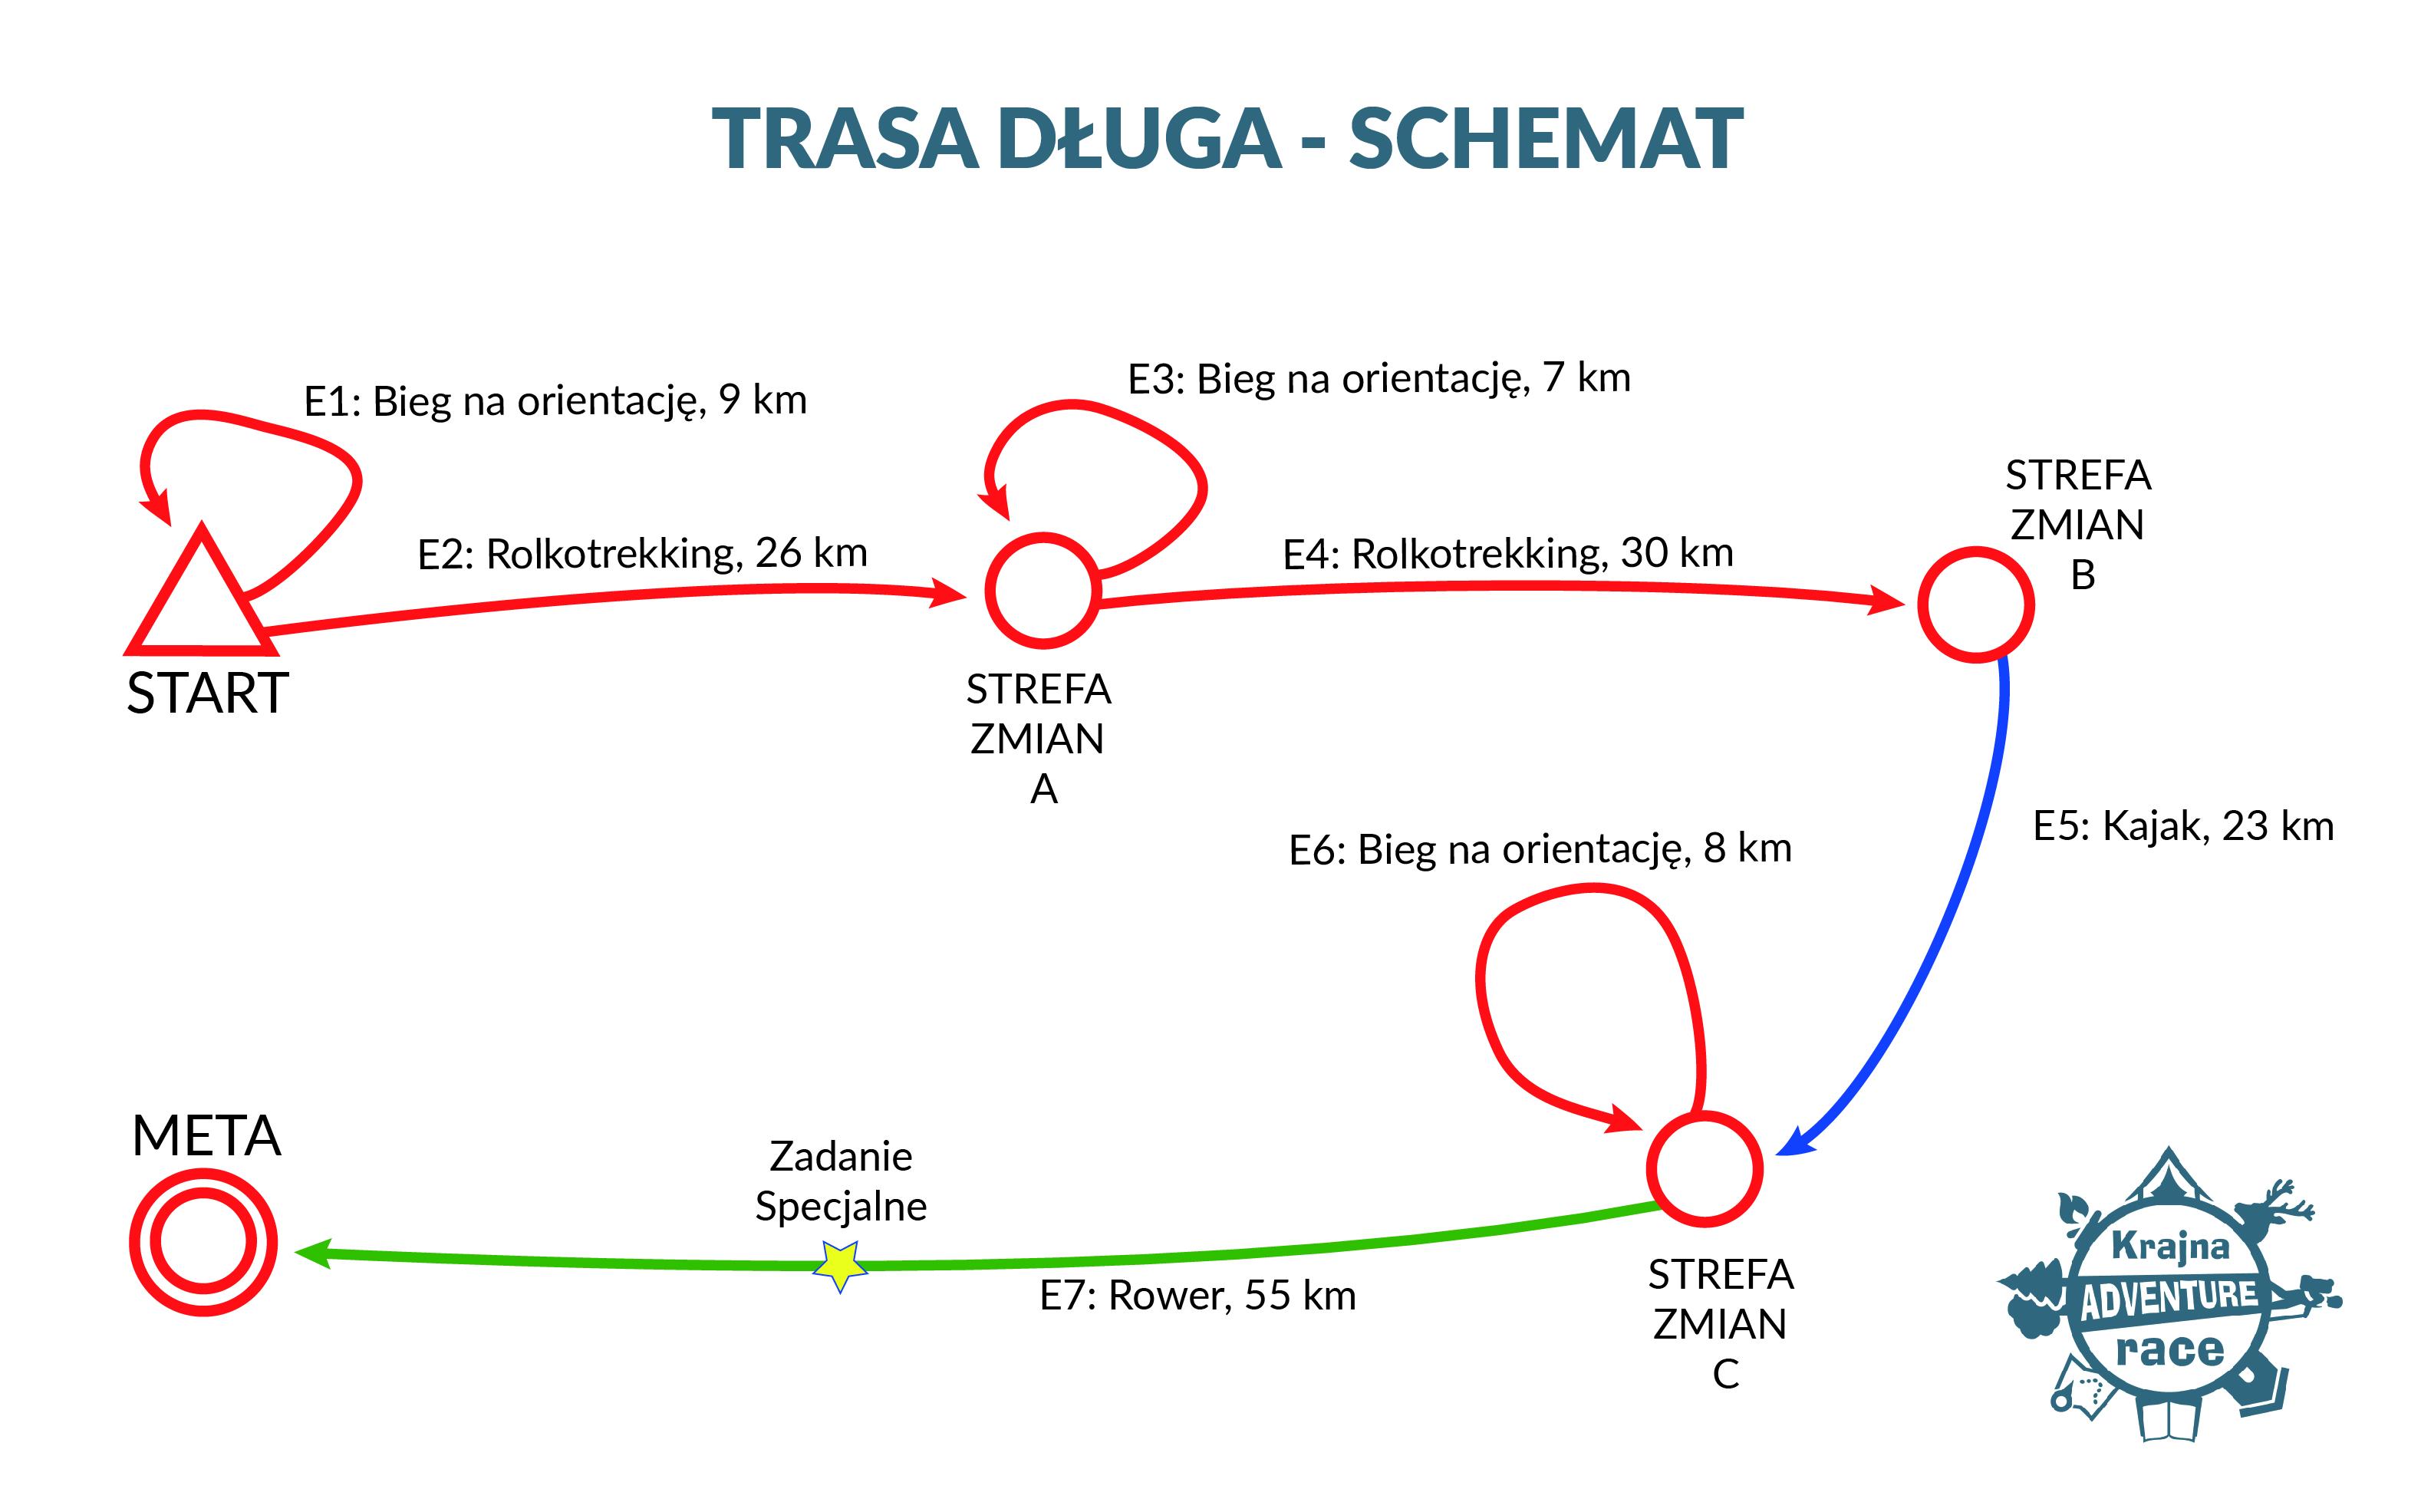 Schemat_trasa dˆuga